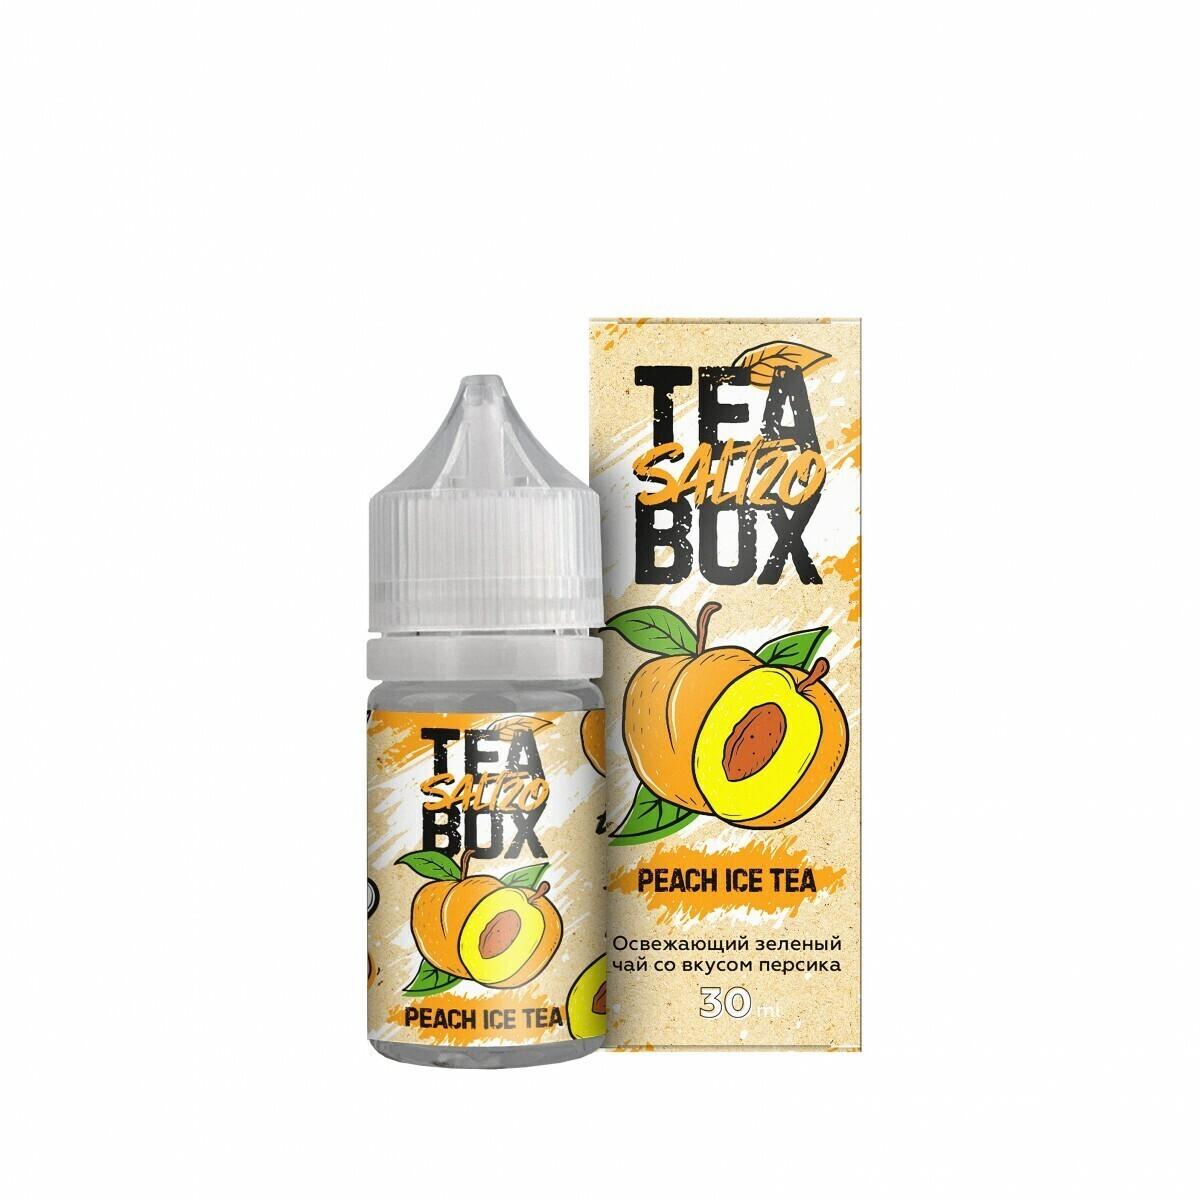 TEA BOX SALT: BERGAMOT PEAR 30ML 20MG STRONG